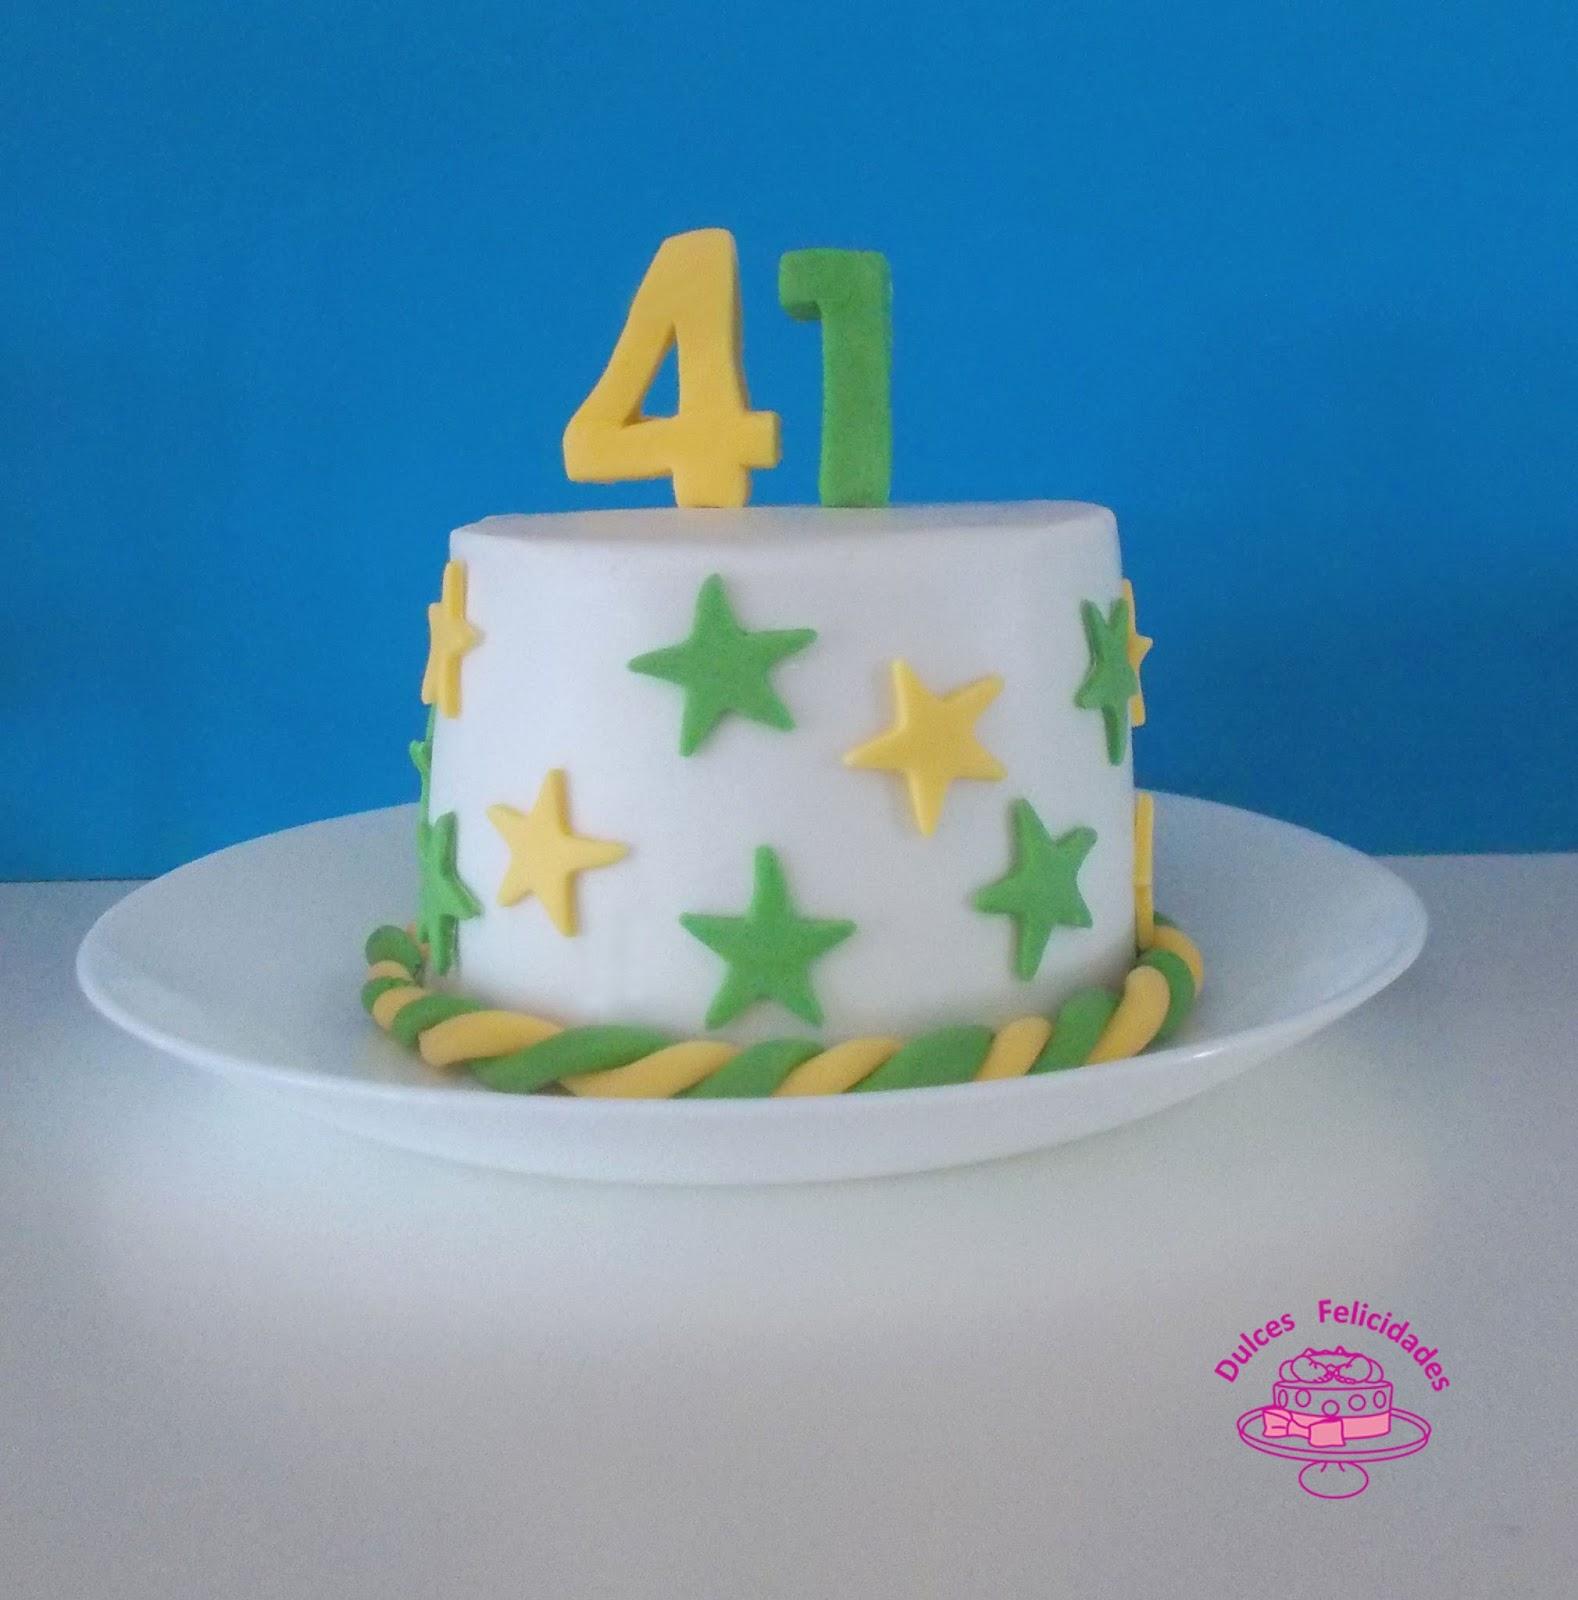 Dulces Felicidades Tarta 41 Cumpleanos - Tartas-cumpleaos